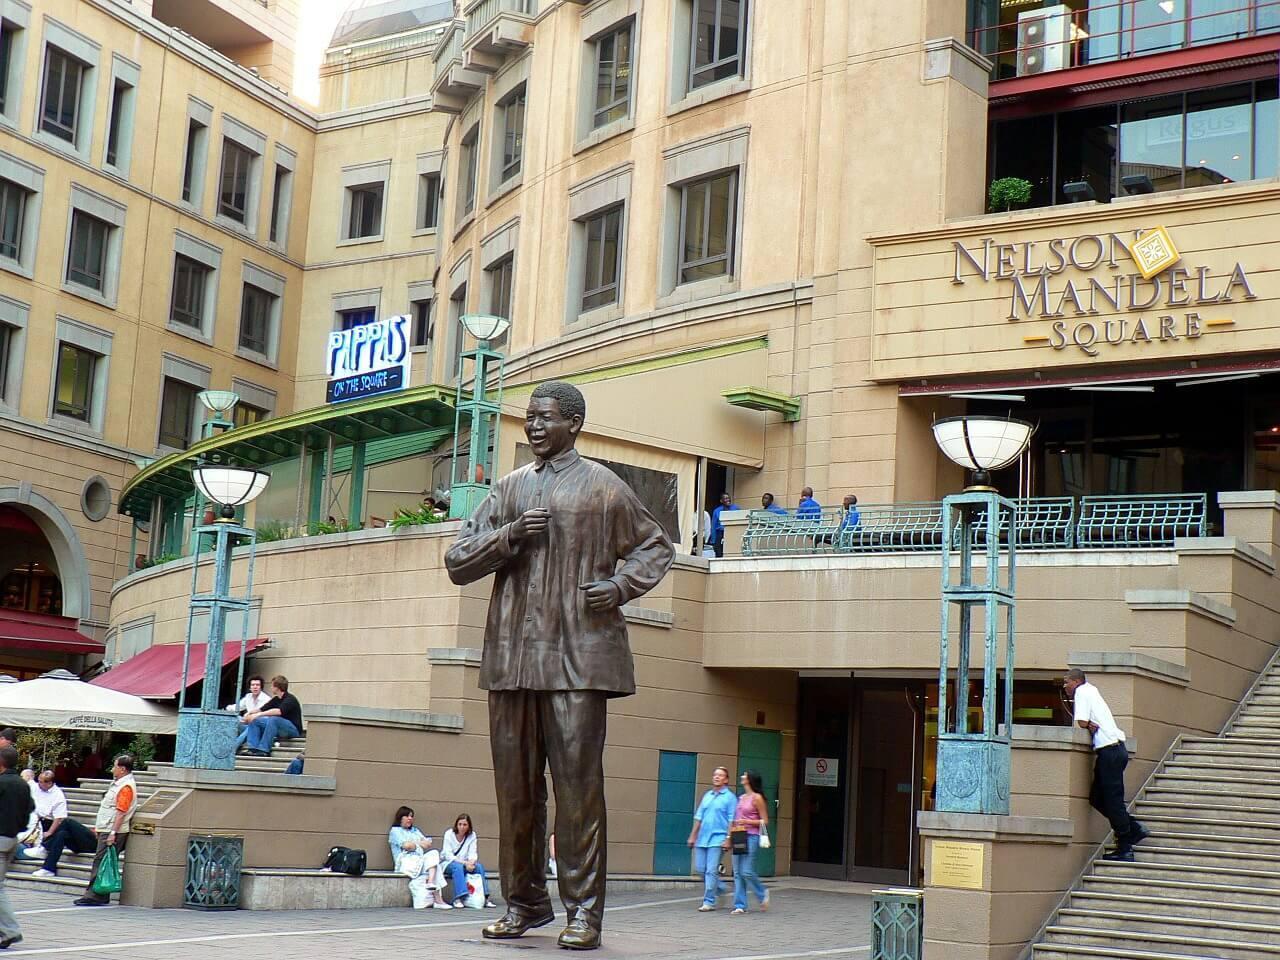 Nelson Mandela Square - Things to do in Johannesburg